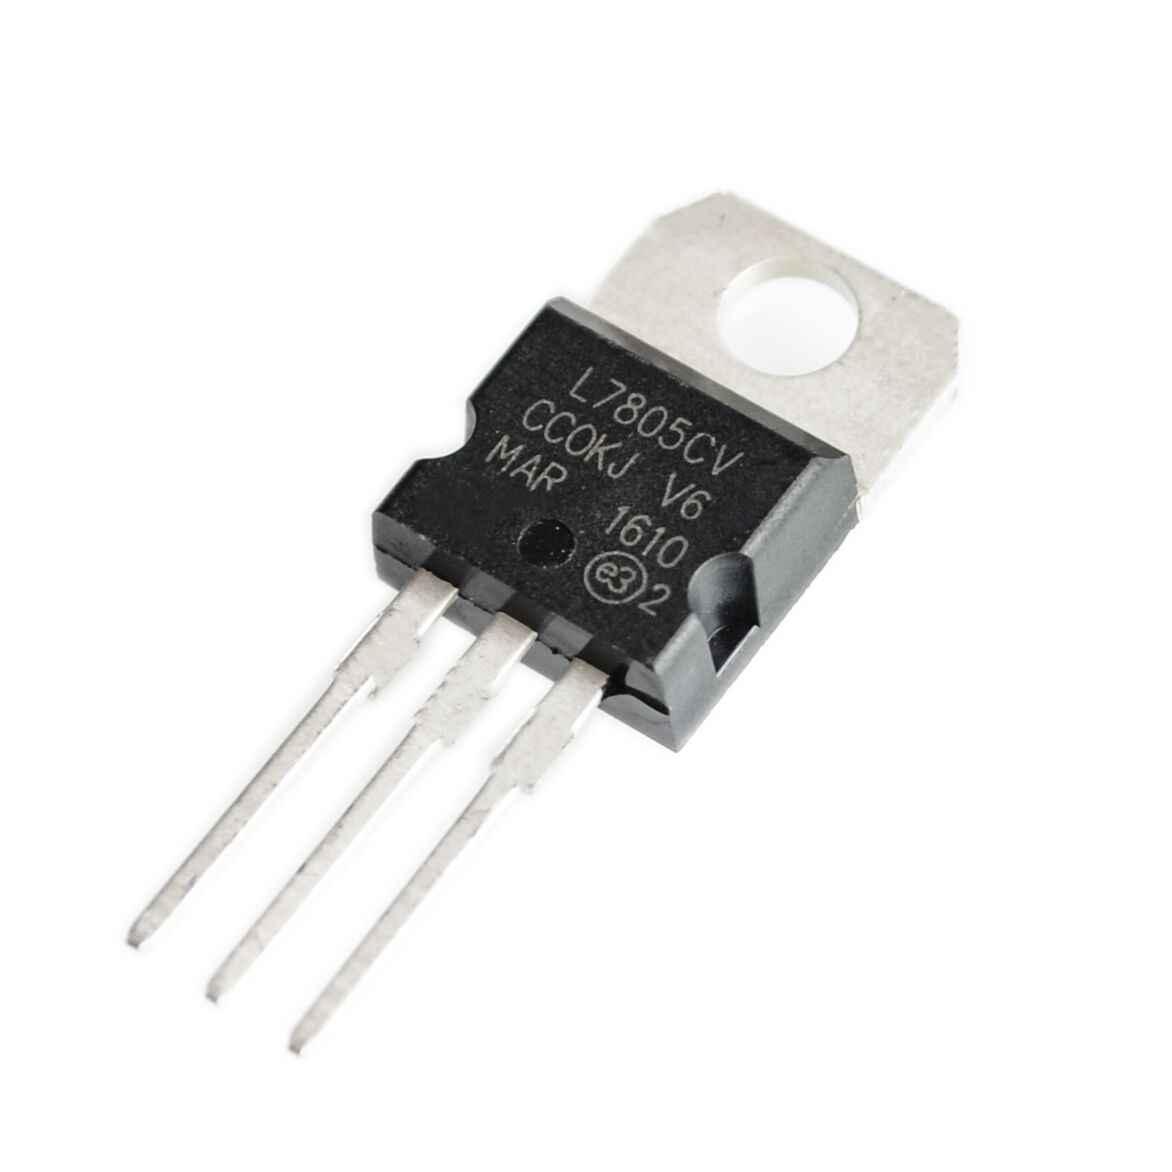 Detail Feedback Questions About 2pcs Eahc All 8value 8pcs 2pc Each Pure Sine Wave Inverter Driver Board Egs002 Eg8010 Ir2110 10pcs L7805cv L7805 7805 Voltage Regulator 5v To 220